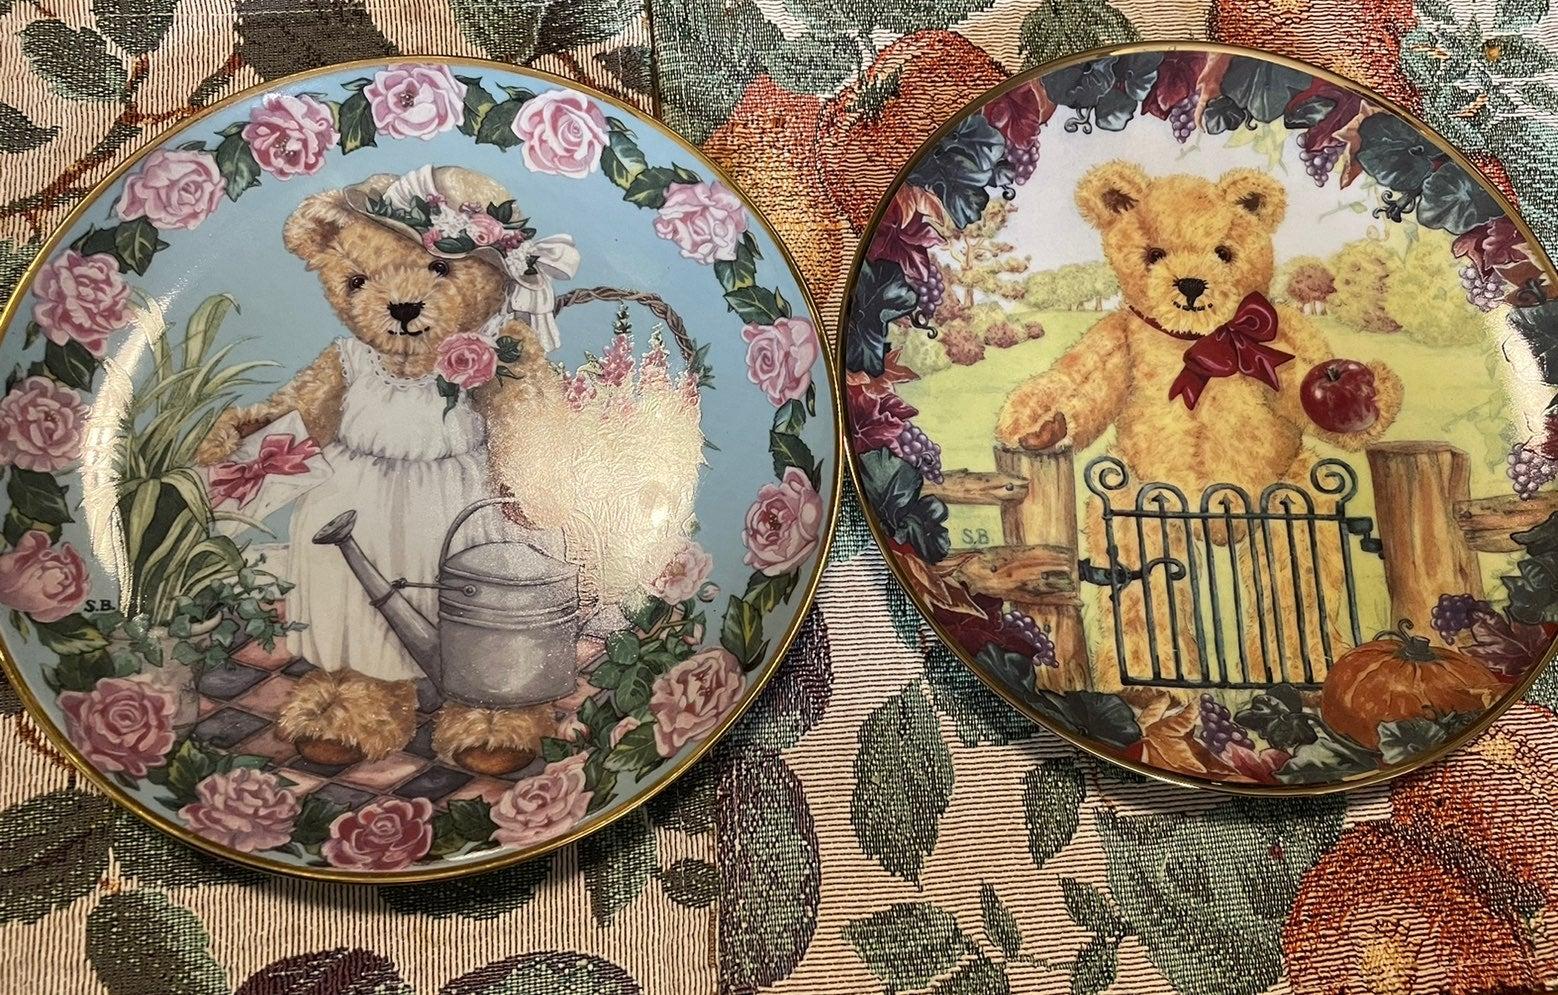 Lot of 2 Franklin Mint Porcelain plates